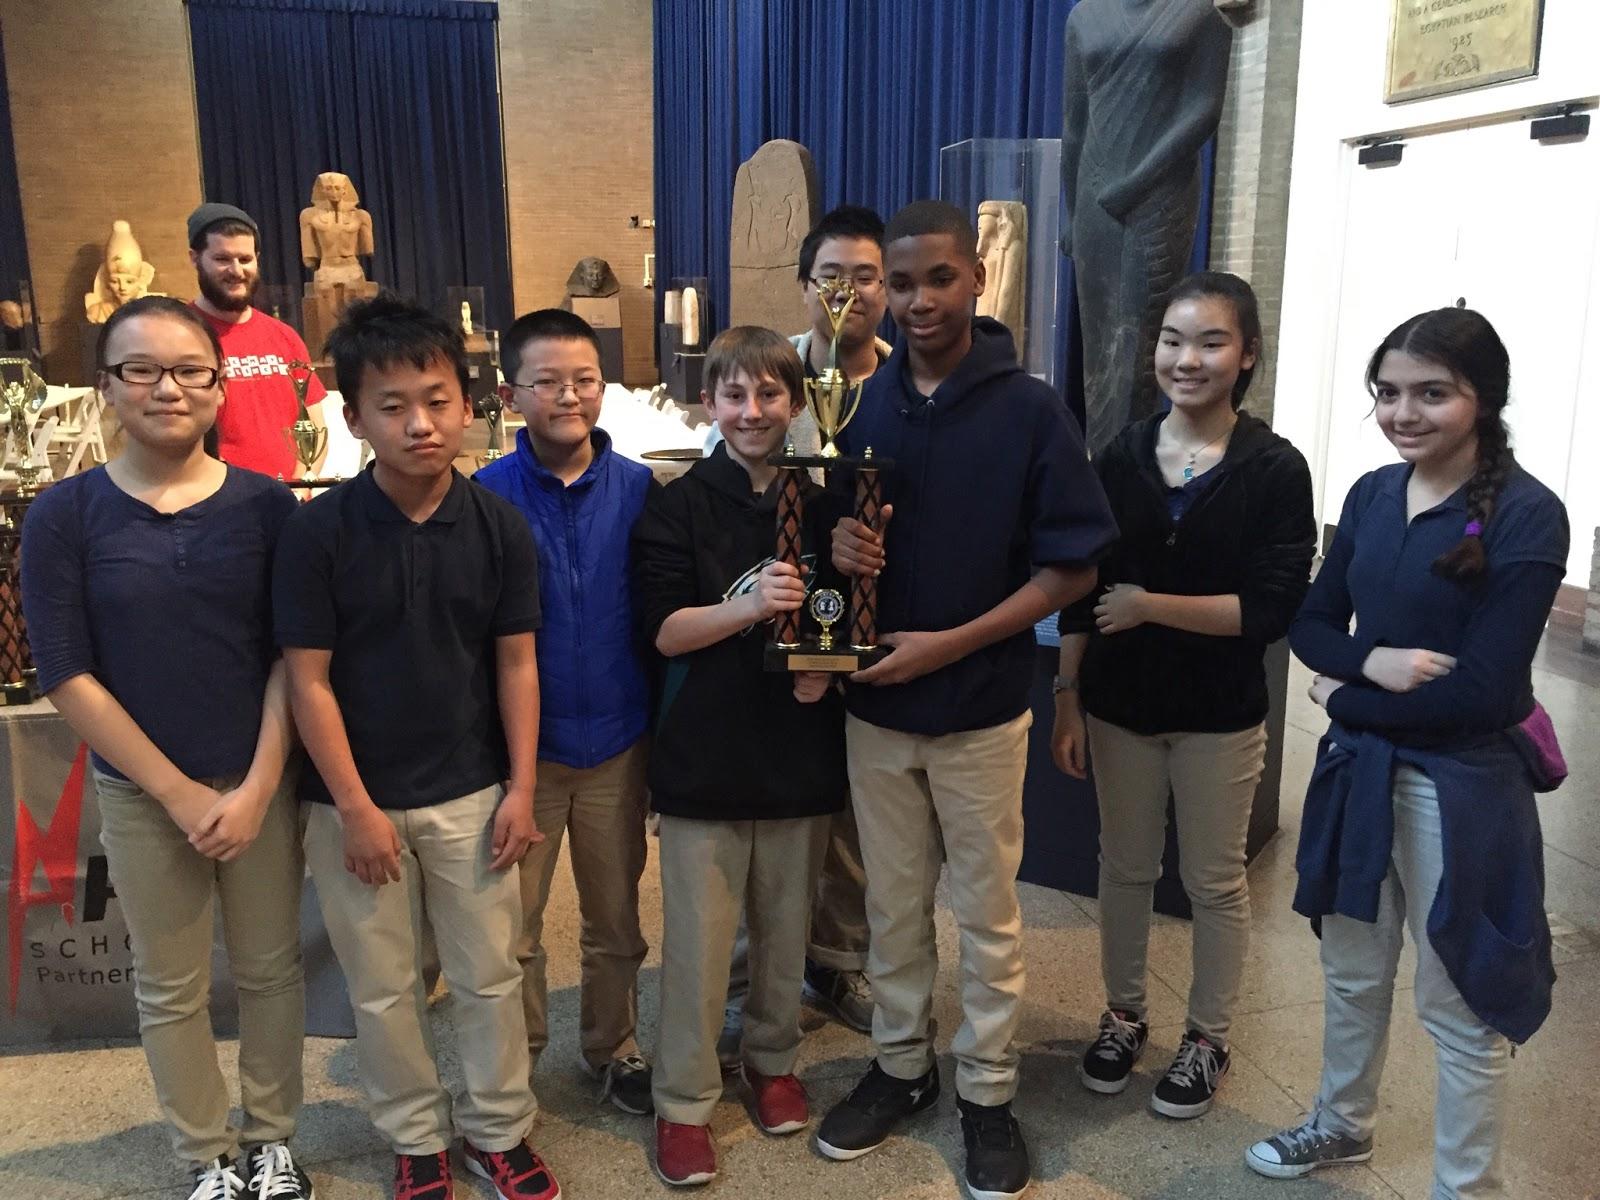 Southwark Chess Club Brings Home a Trophy | Southwark School K-8